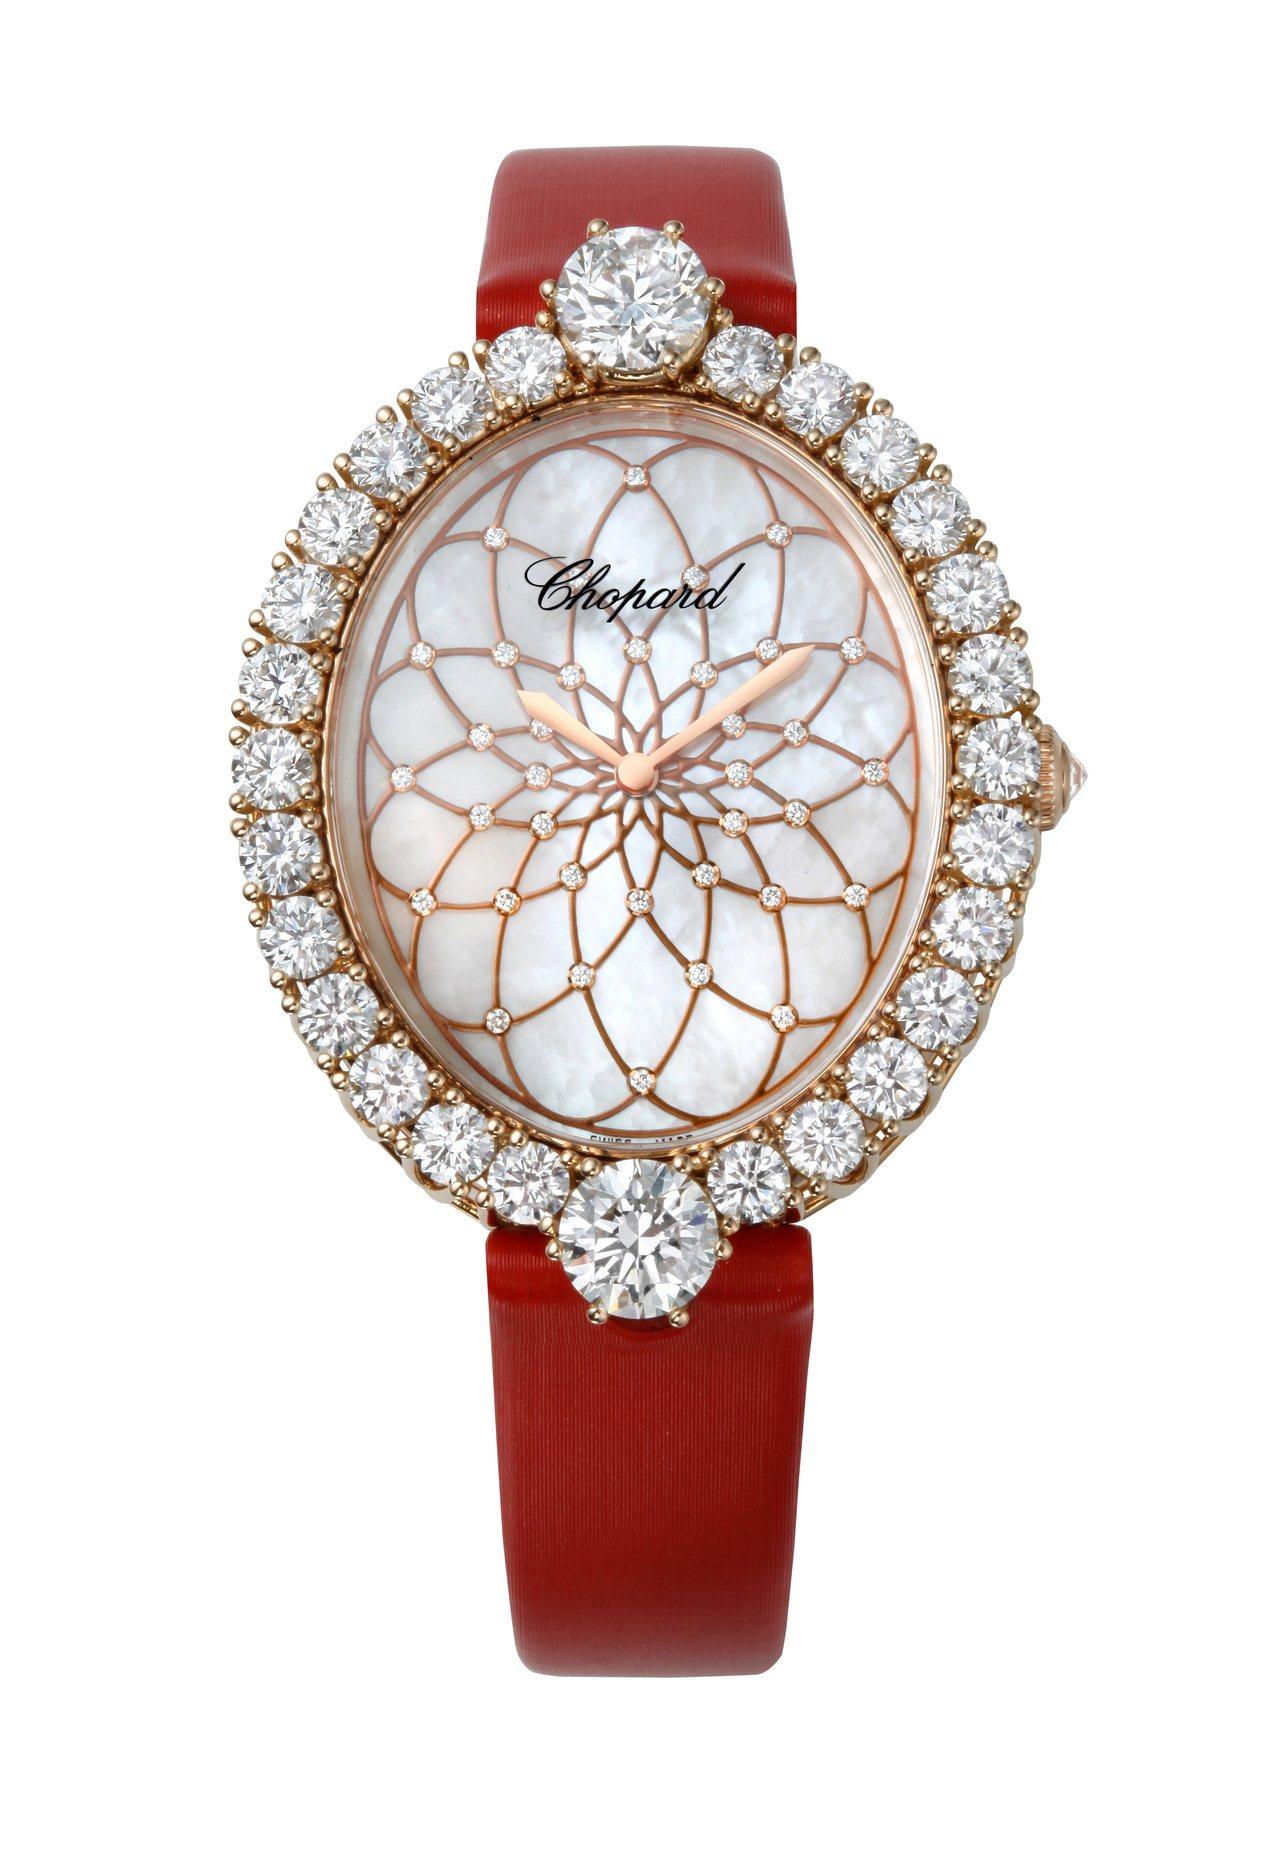 L'Heure du Diamant系列腕表,18K玫瑰金鑲嵌總重2.02克拉鑽...